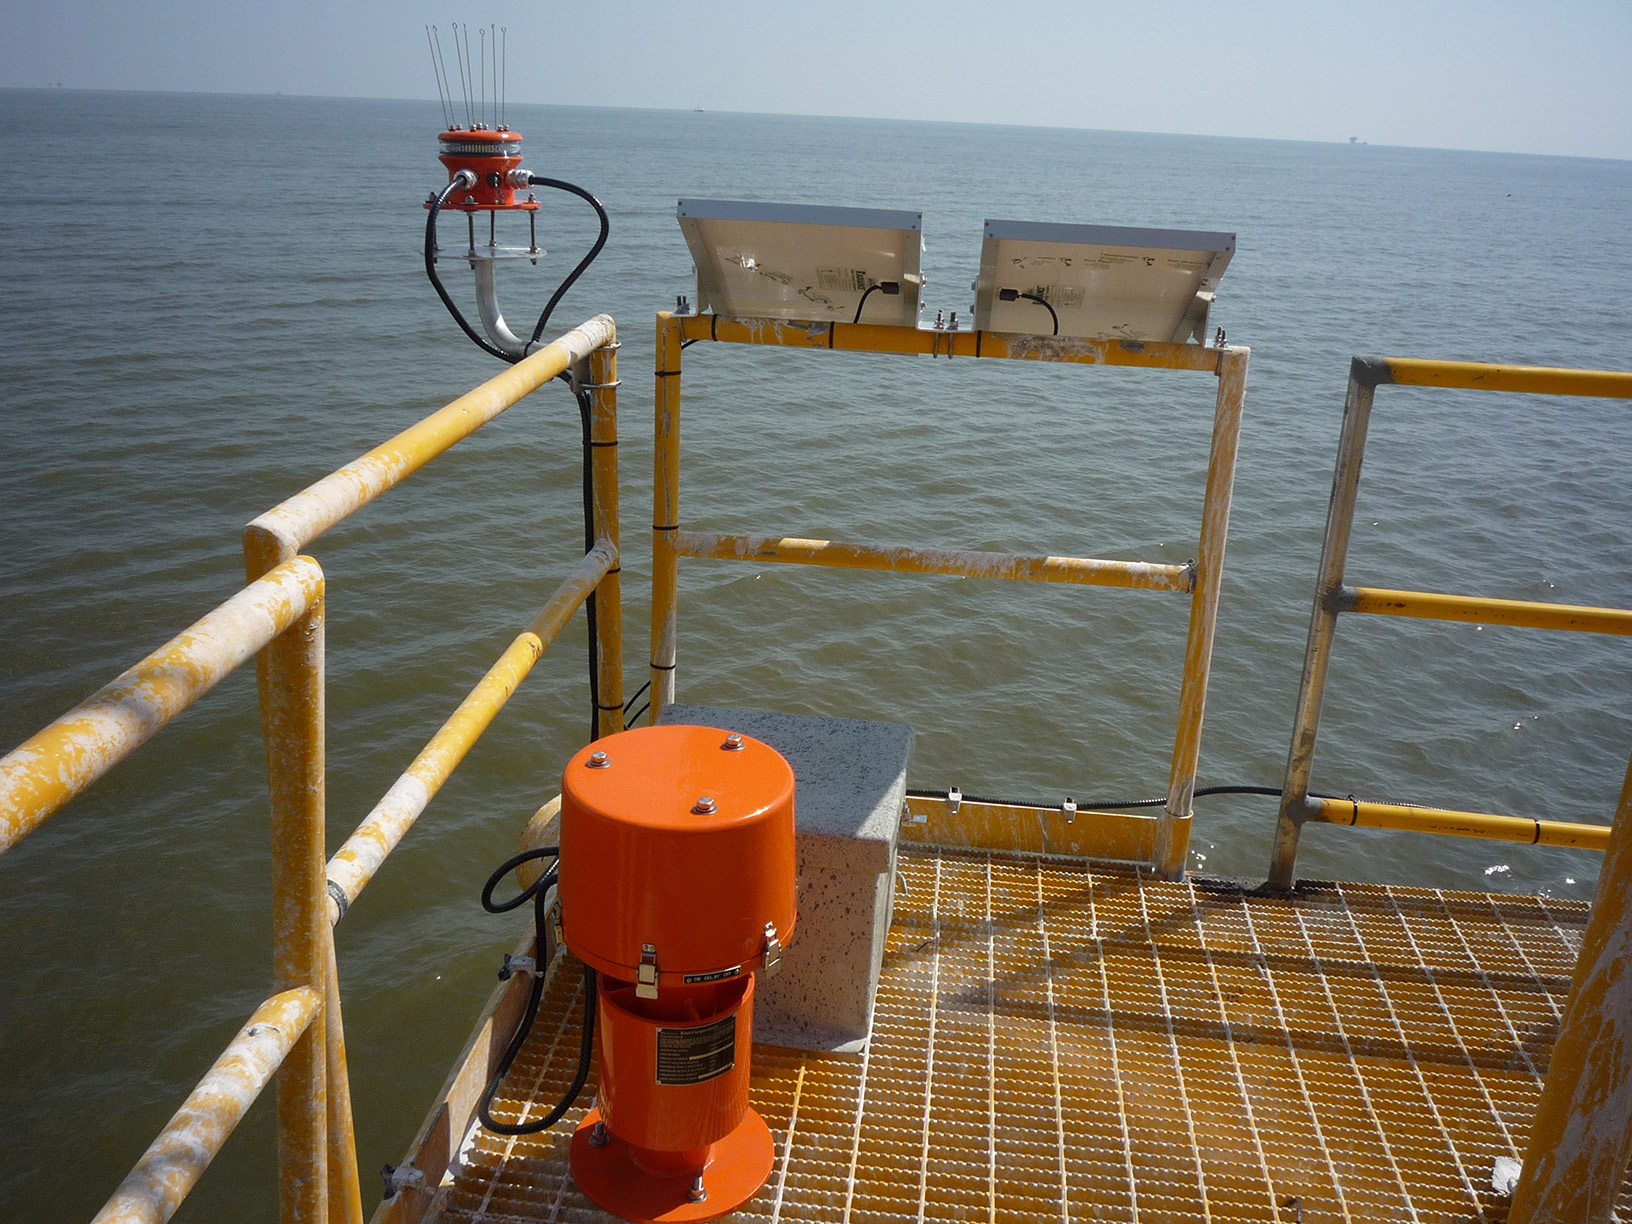 maritime foghorn aid to navigation